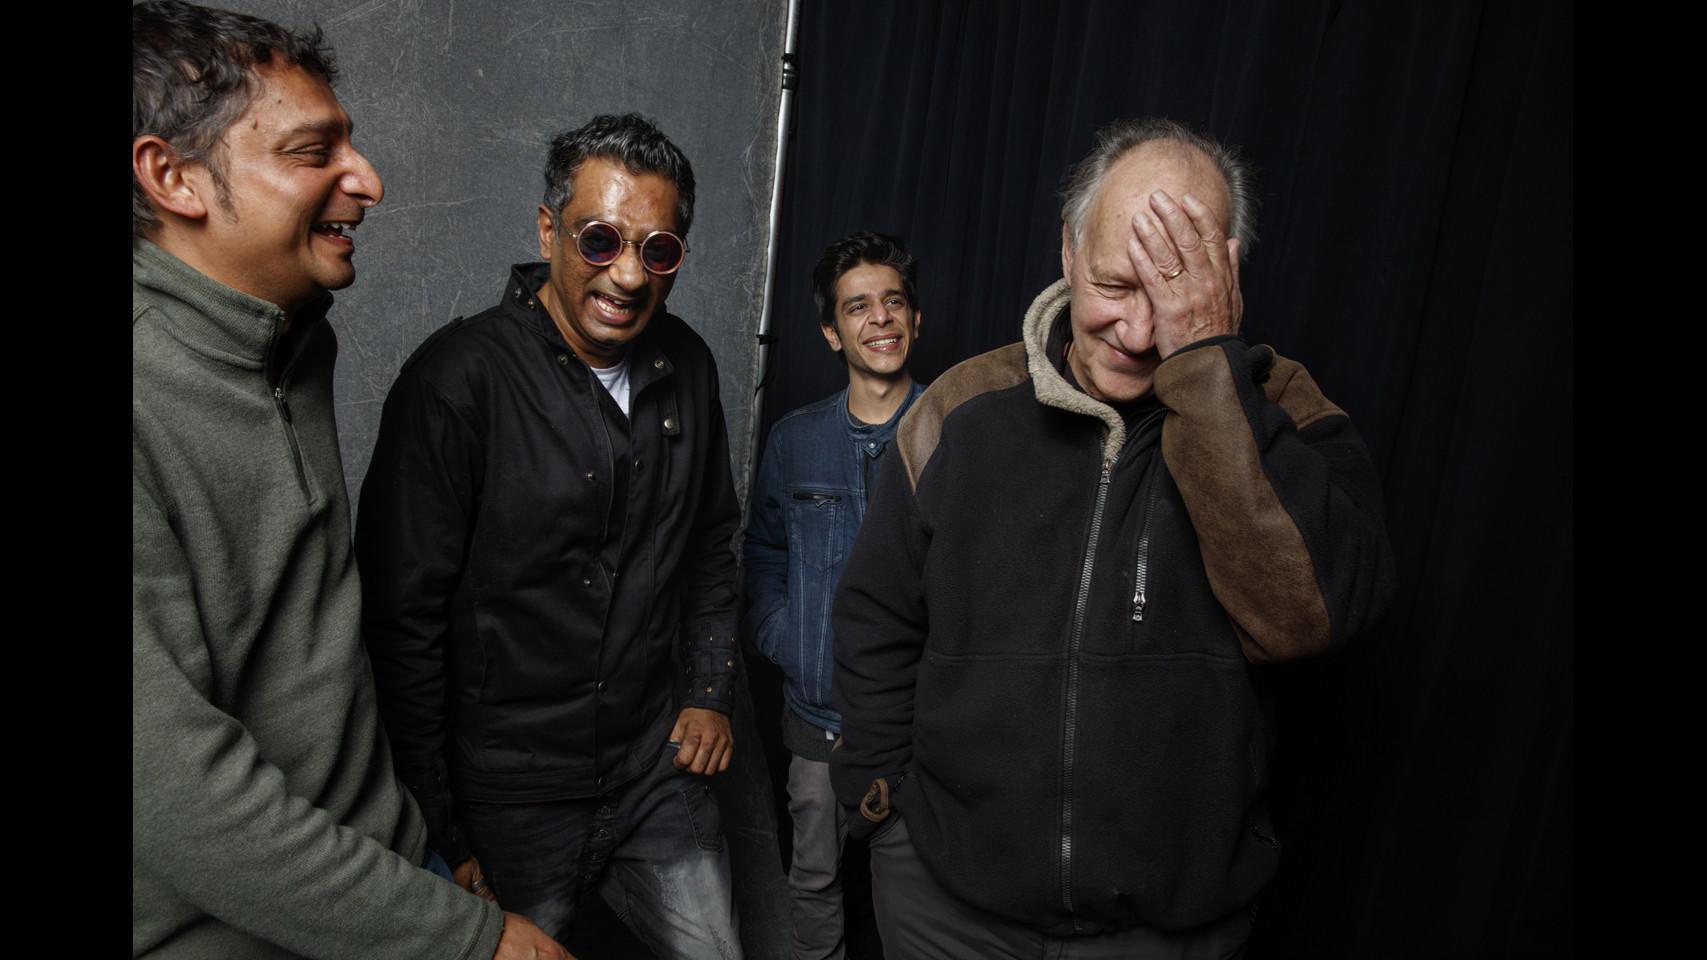 Naman Ramachandran, left, Q., and Shashank Arora with Werner Herzog. (Jay L. Clendenin / Los Angeles Times)